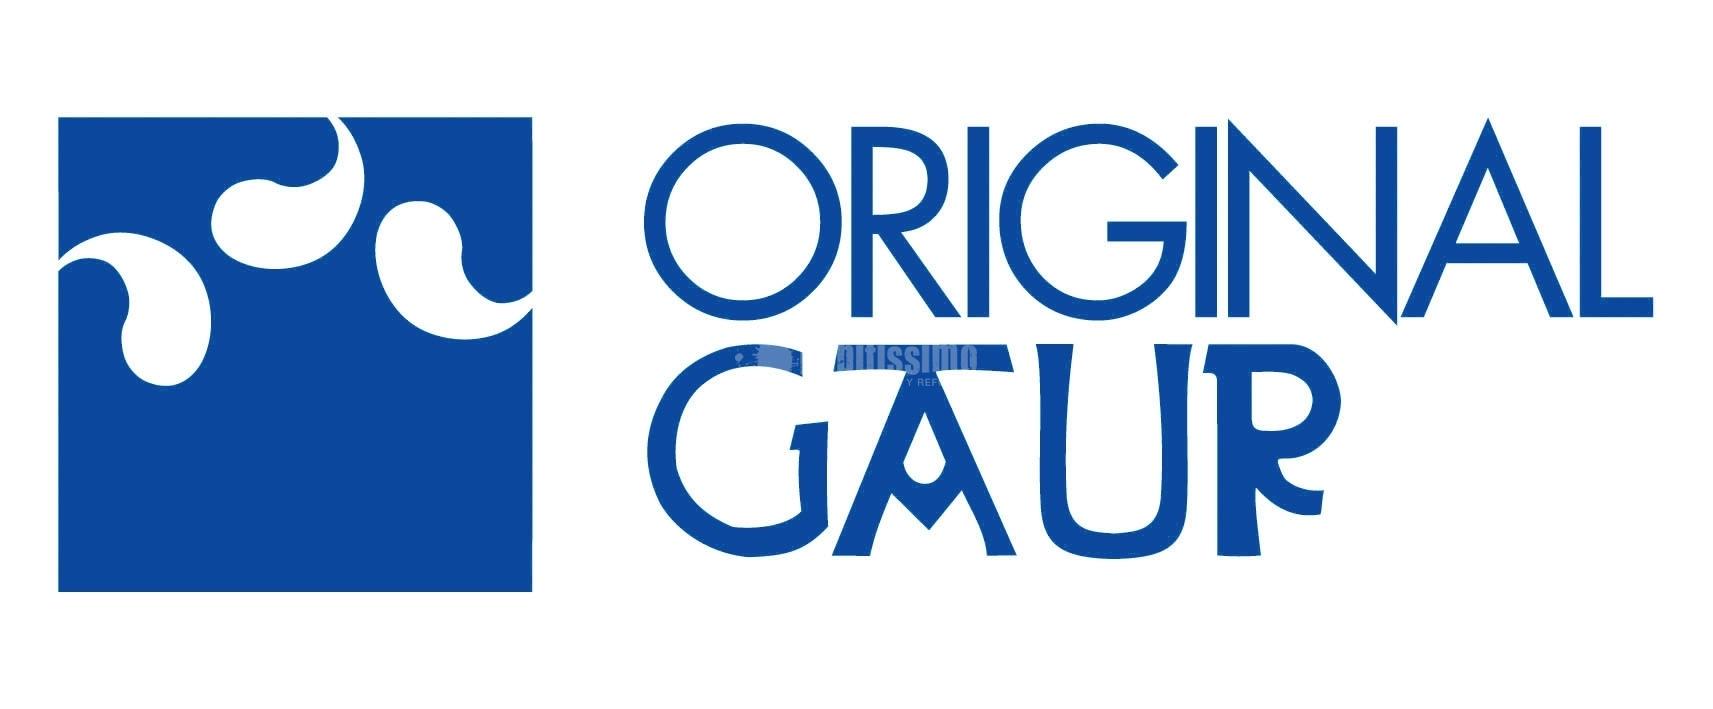 Original Gaur